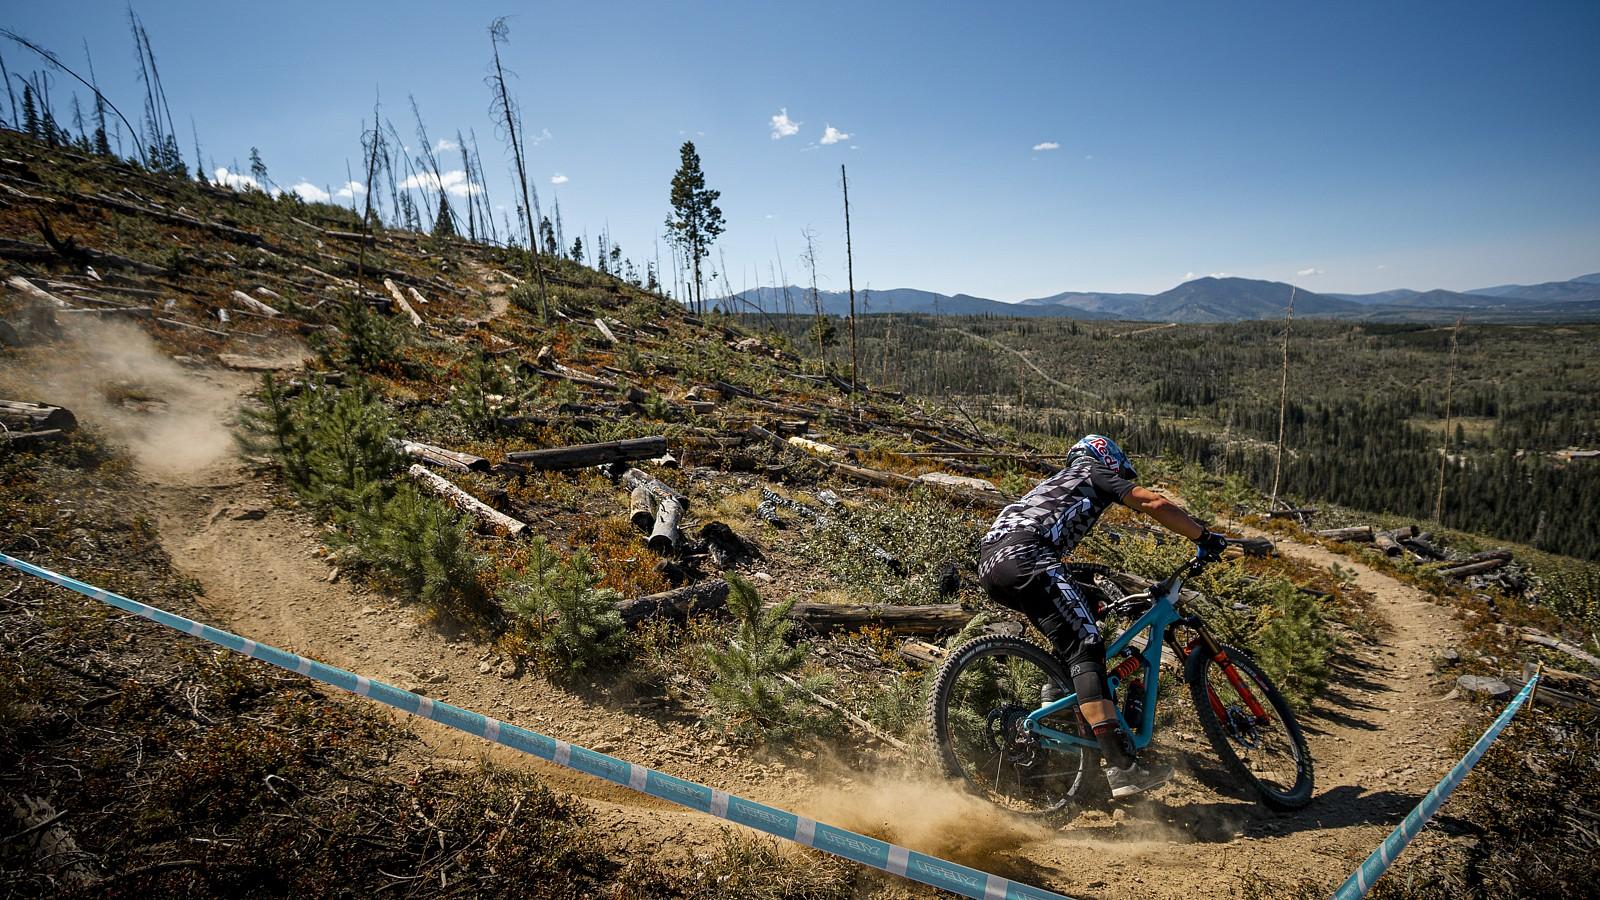 Richie Rude - BME - Matt_Jones_Photo - Mountain Biking Pictures - Vital MTB